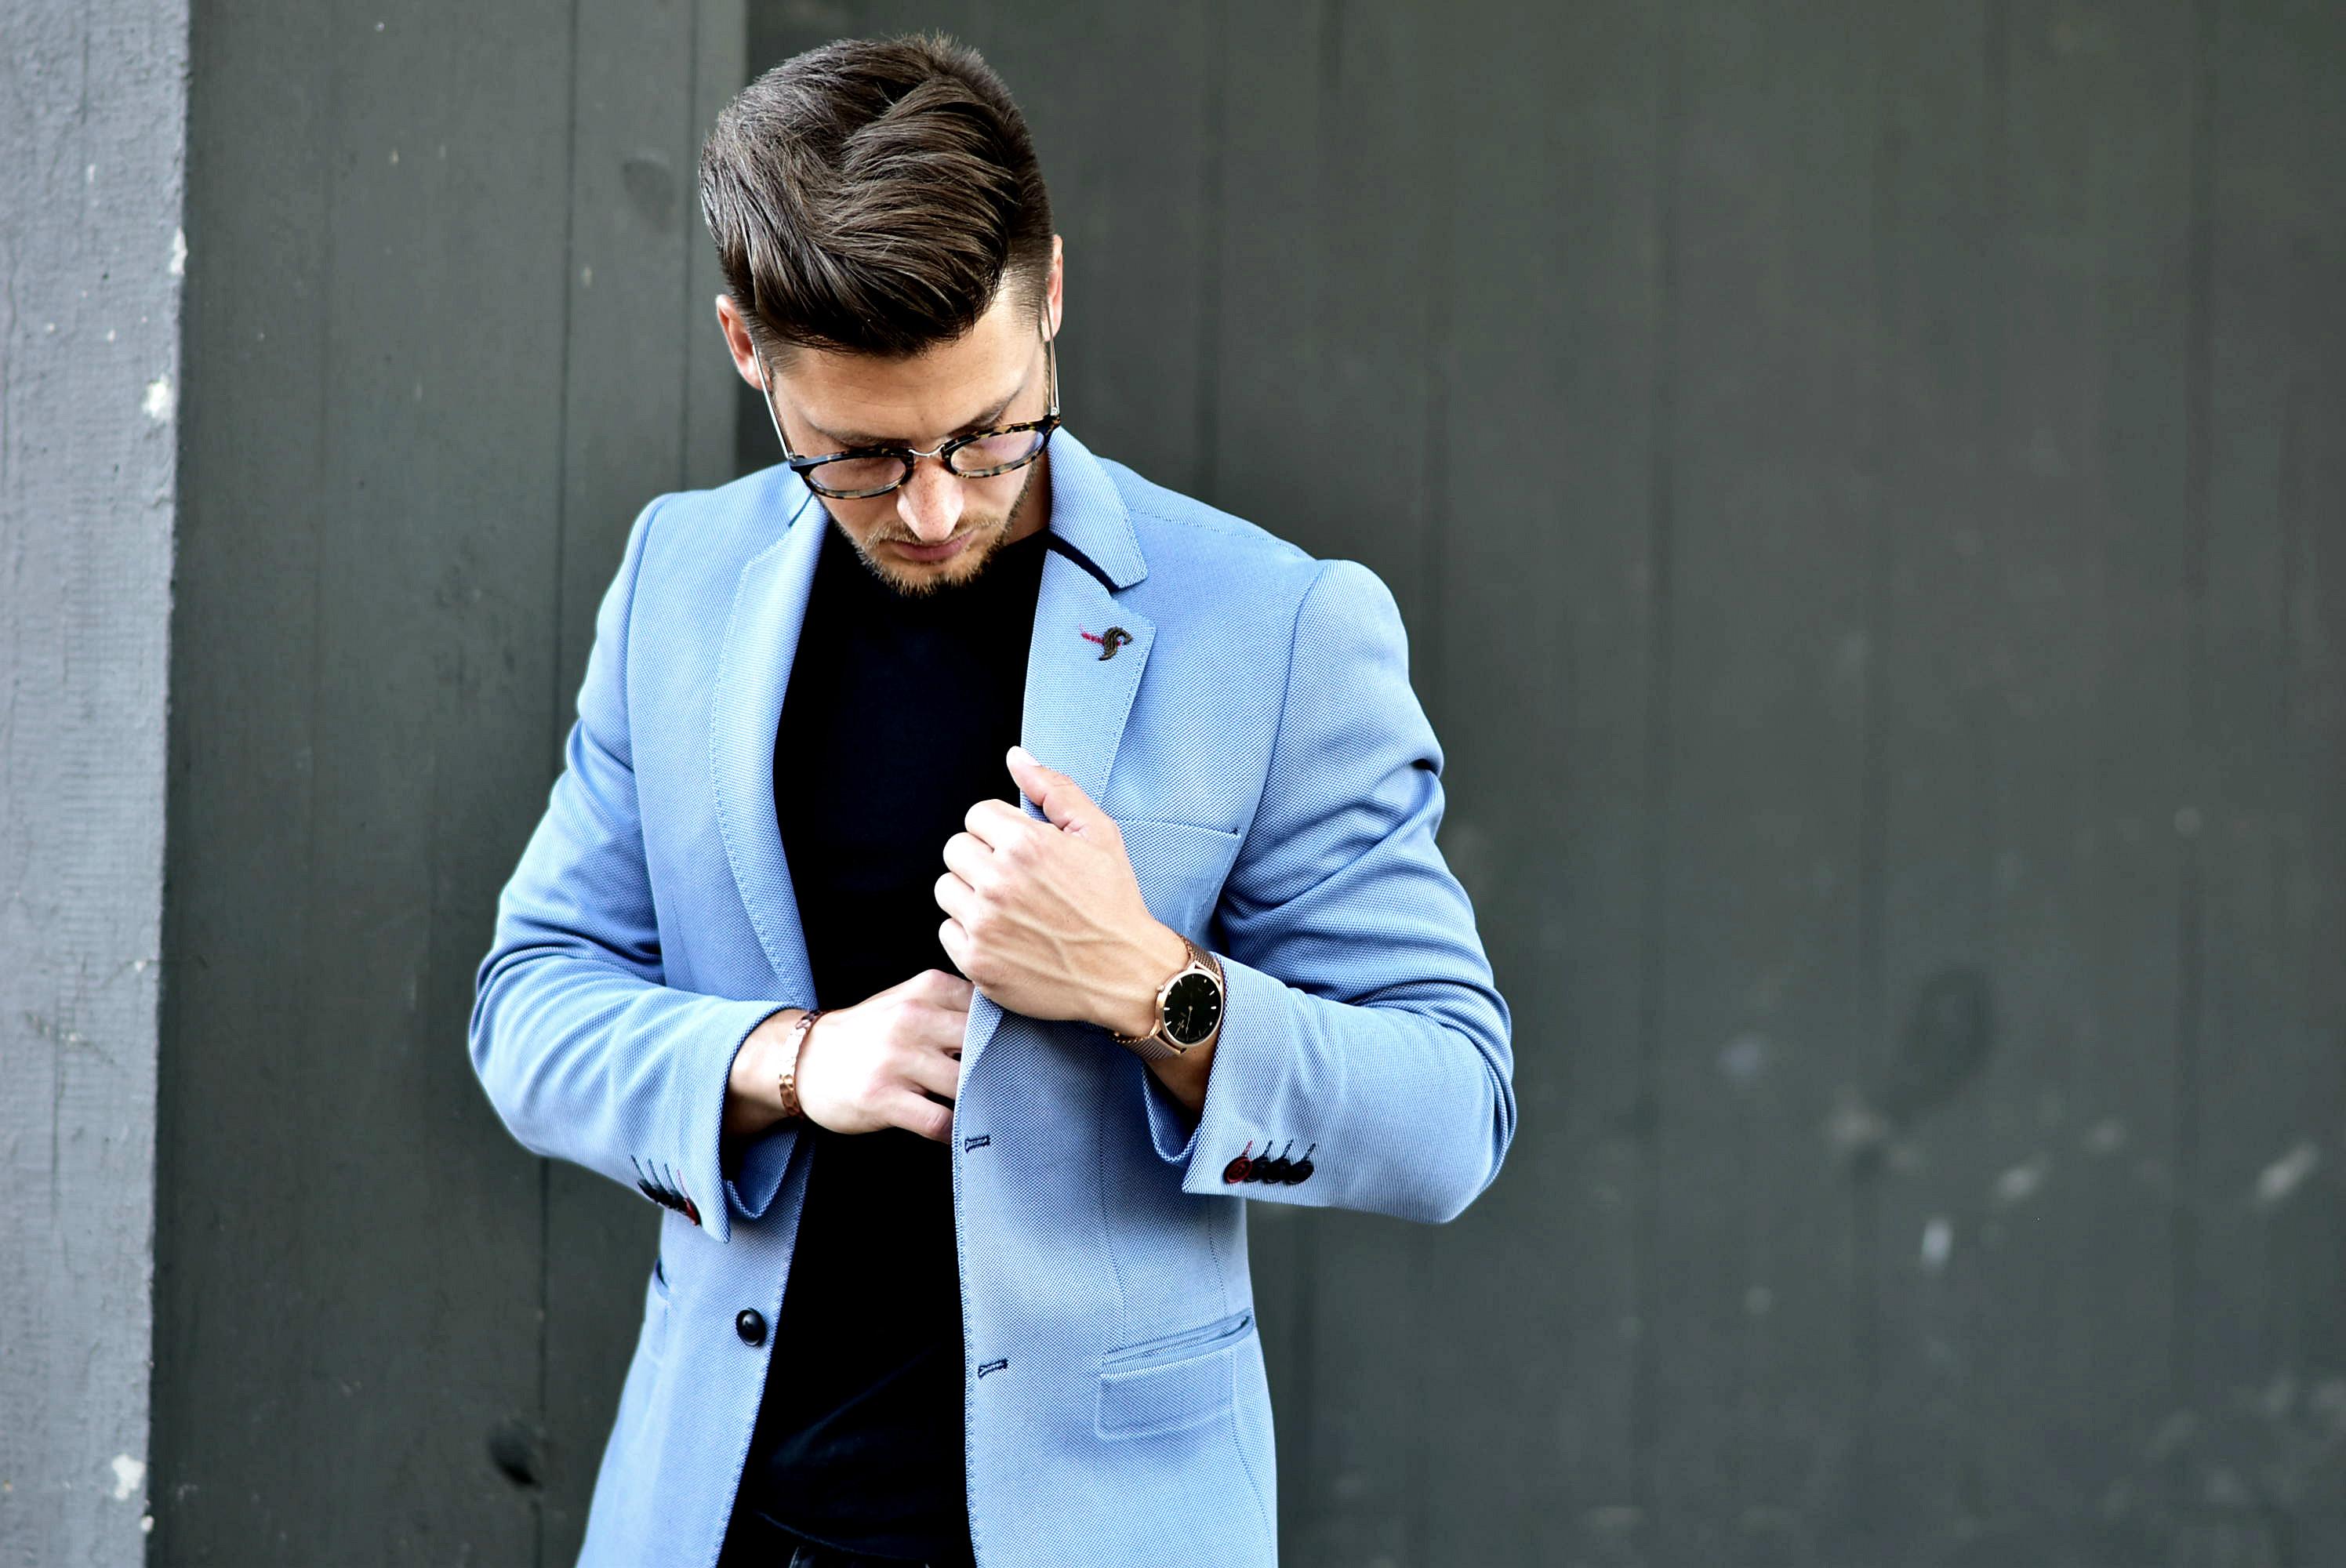 Tommeezjerry-Styleblog-Männerblog-Männer-Modeblog-Berlin-Berlinblog-Outfit-Streetlook-Royalblauer-Blazer-Royalblue-All-Black-Look-Chelsea-Boots-Skinny-Jeans-5